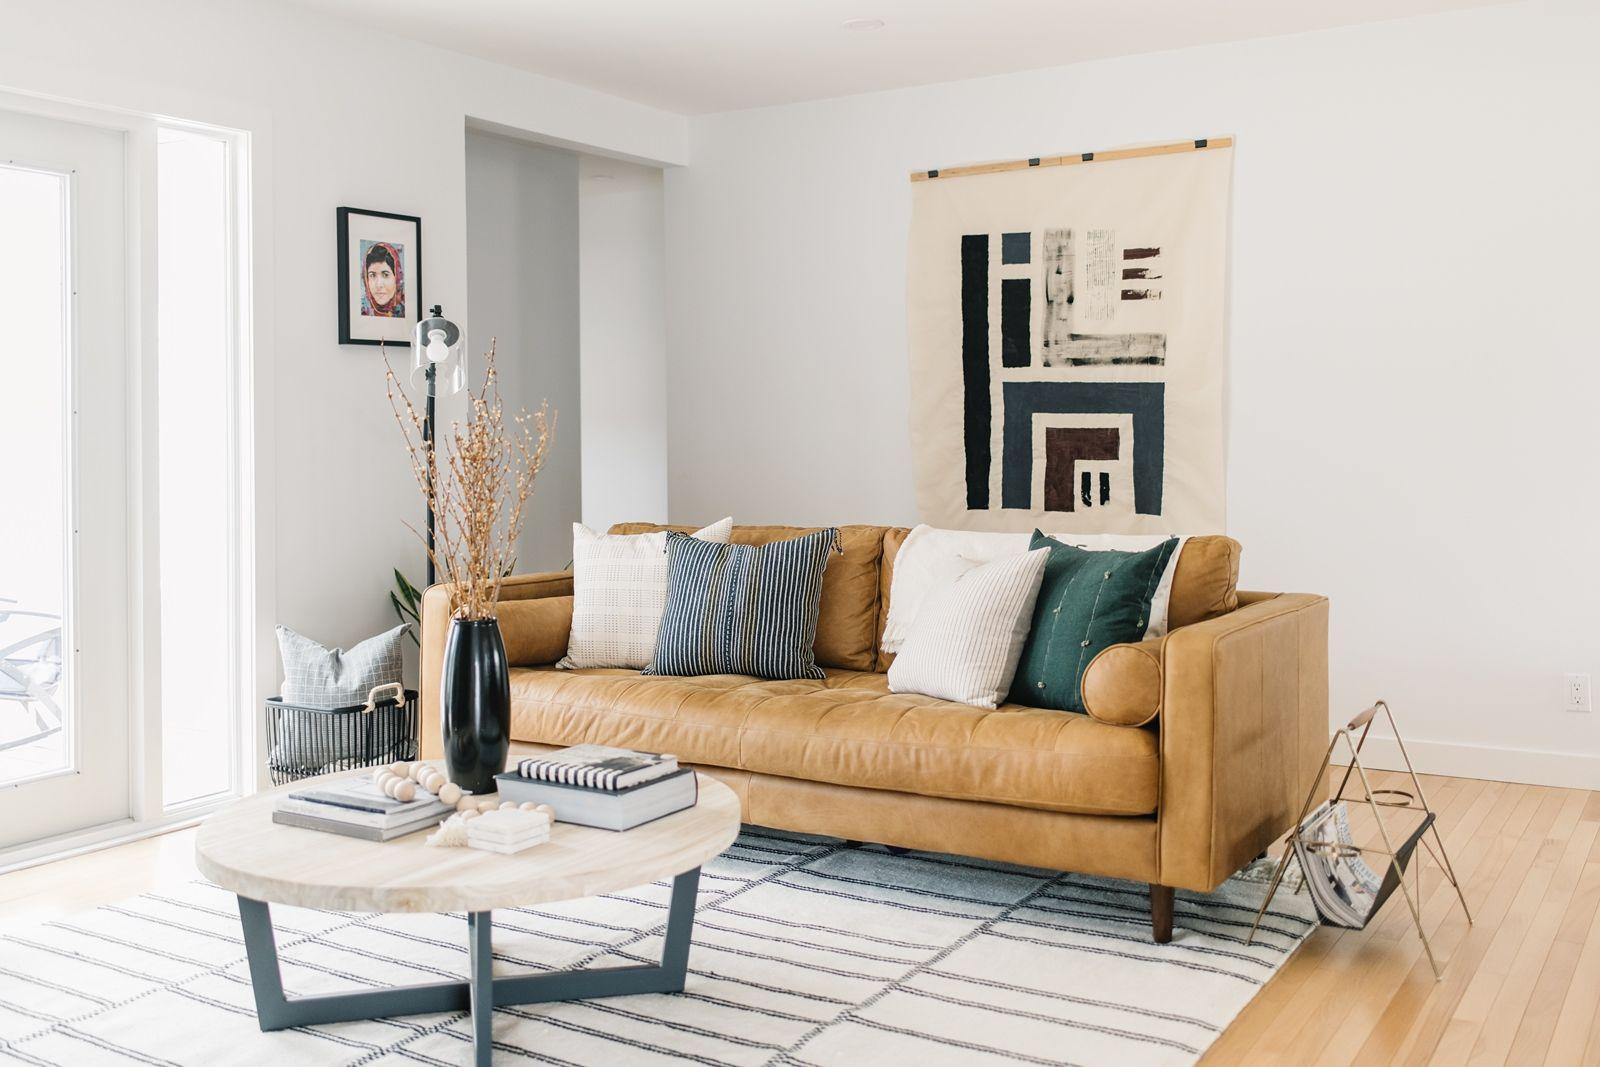 Scandinavian Modern Home Tracey Jazmin Interior Photographer In 2020 Interior Mid Century Modern Interior Design Cushions On Sofa